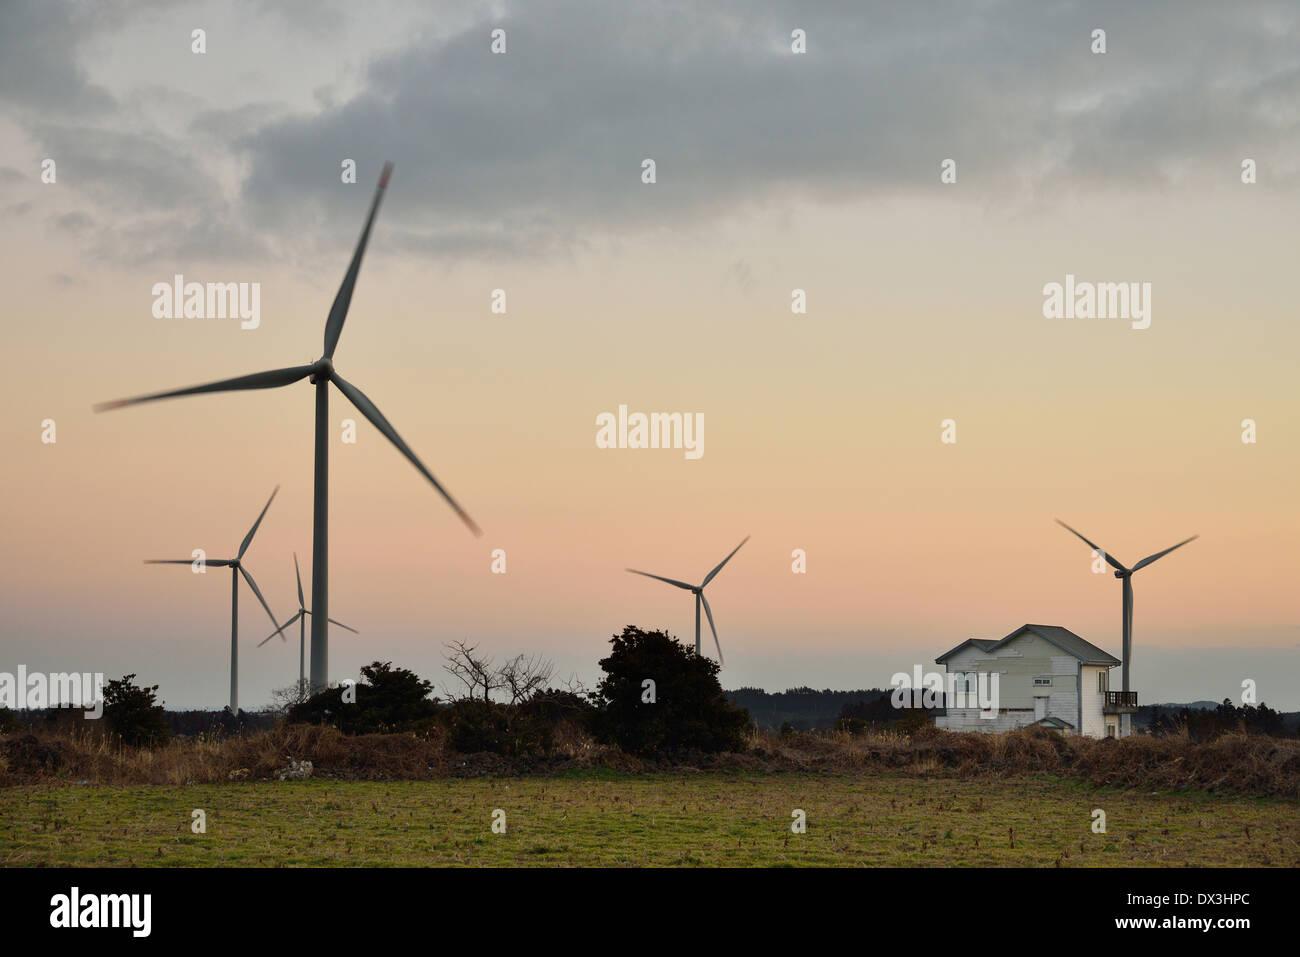 Elektro Power Generator Windkraftanlage über ein bewölkter Himmel Stockbild